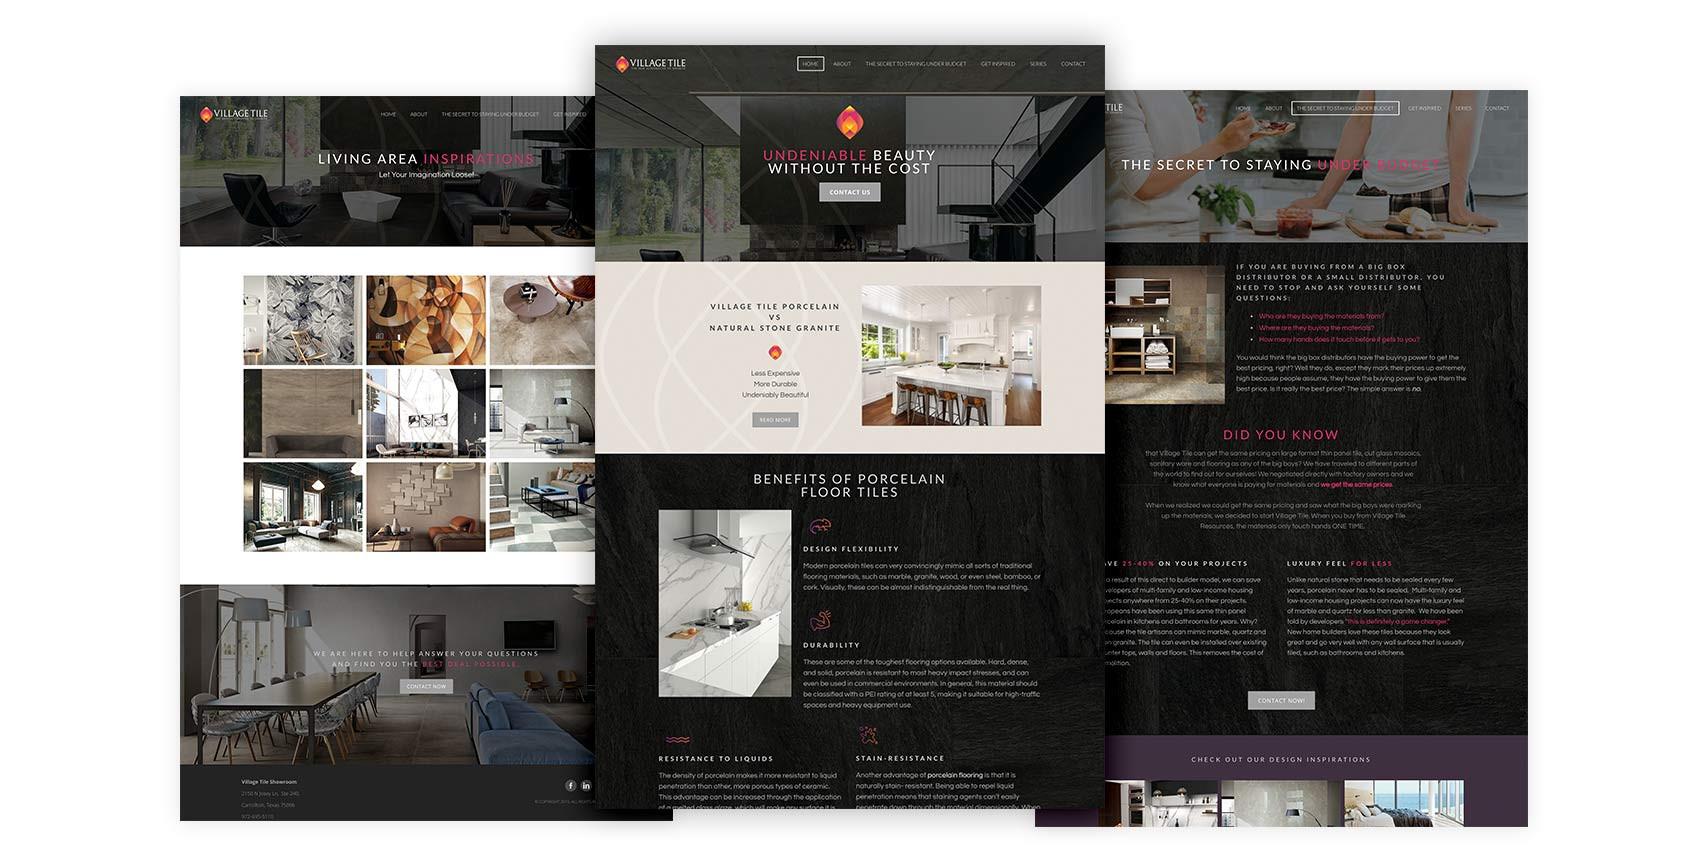 tiles-Website-Mockup-PSD-2018.jpg